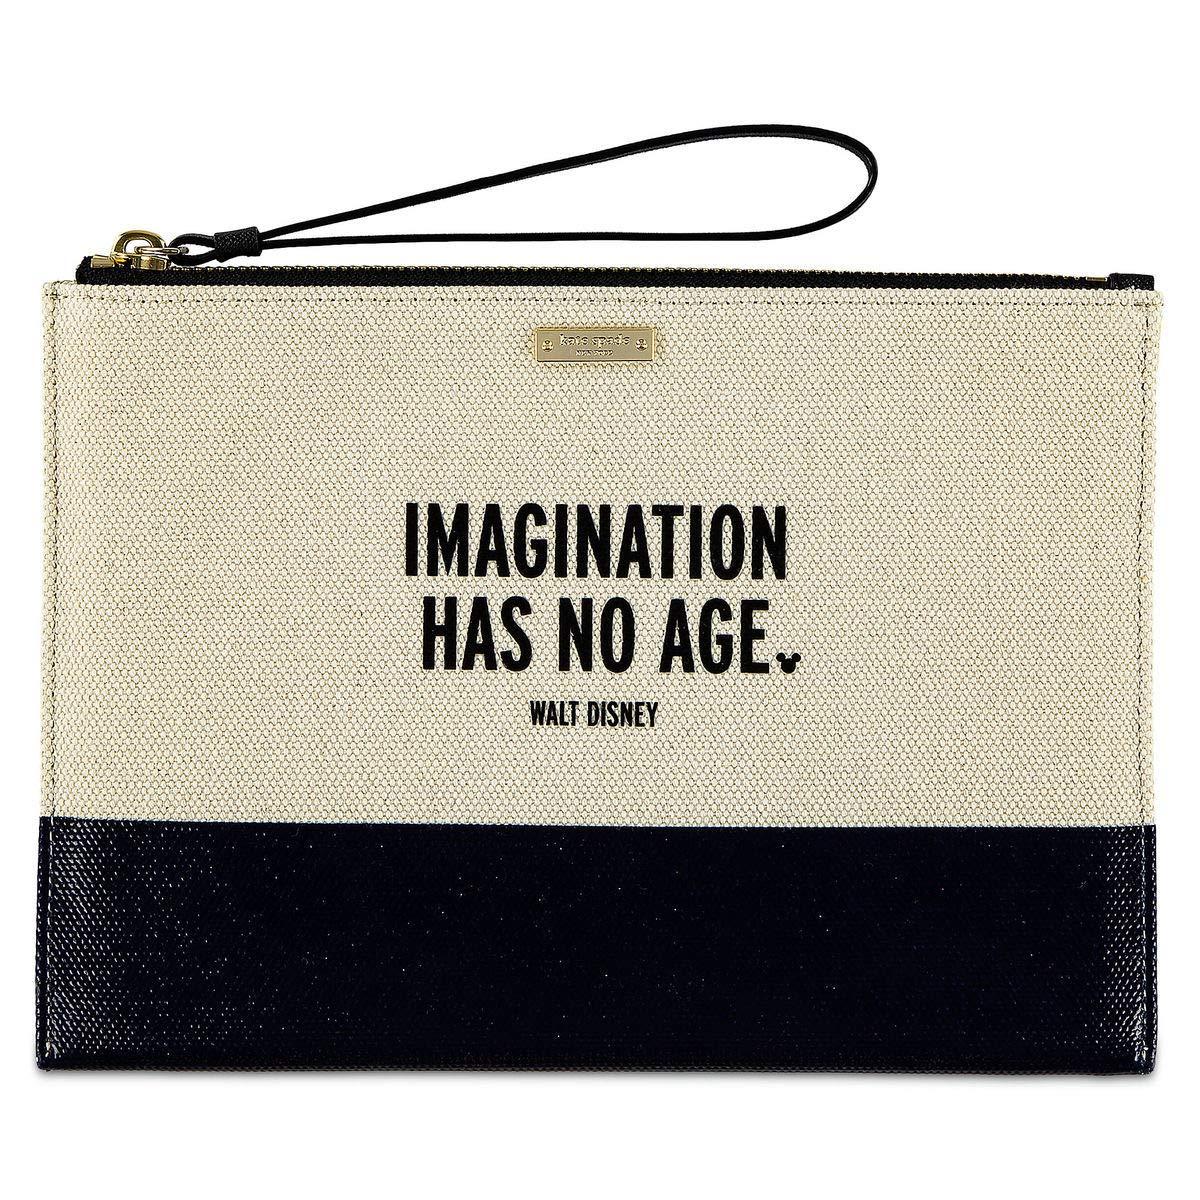 Disney ''Imagination Has No Age'' Canvas Clutch Bag Purse By Kate spade New York